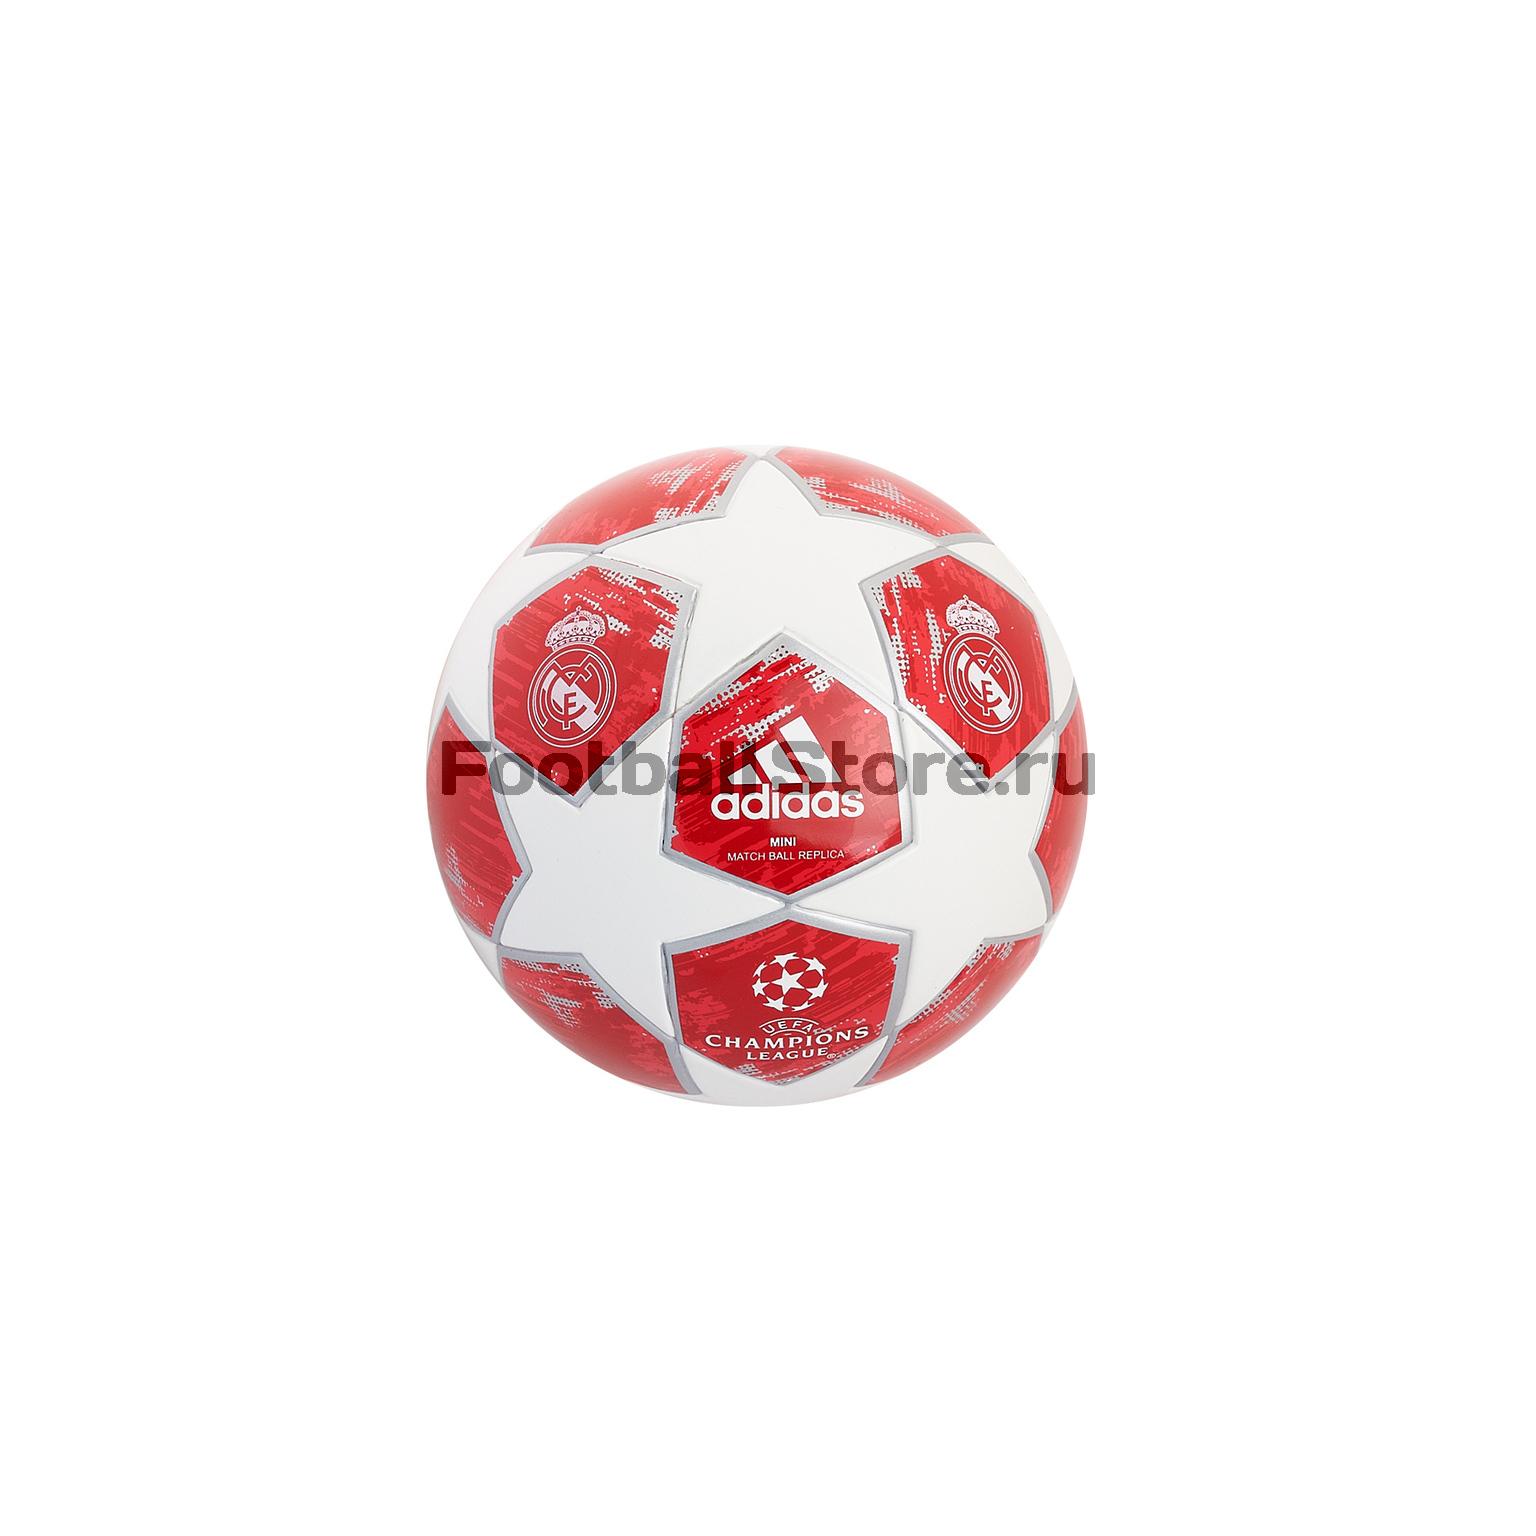 Мяч сувенирный Adidas Real Madrid CW4137 рюкзак adidas real madrid cy5597